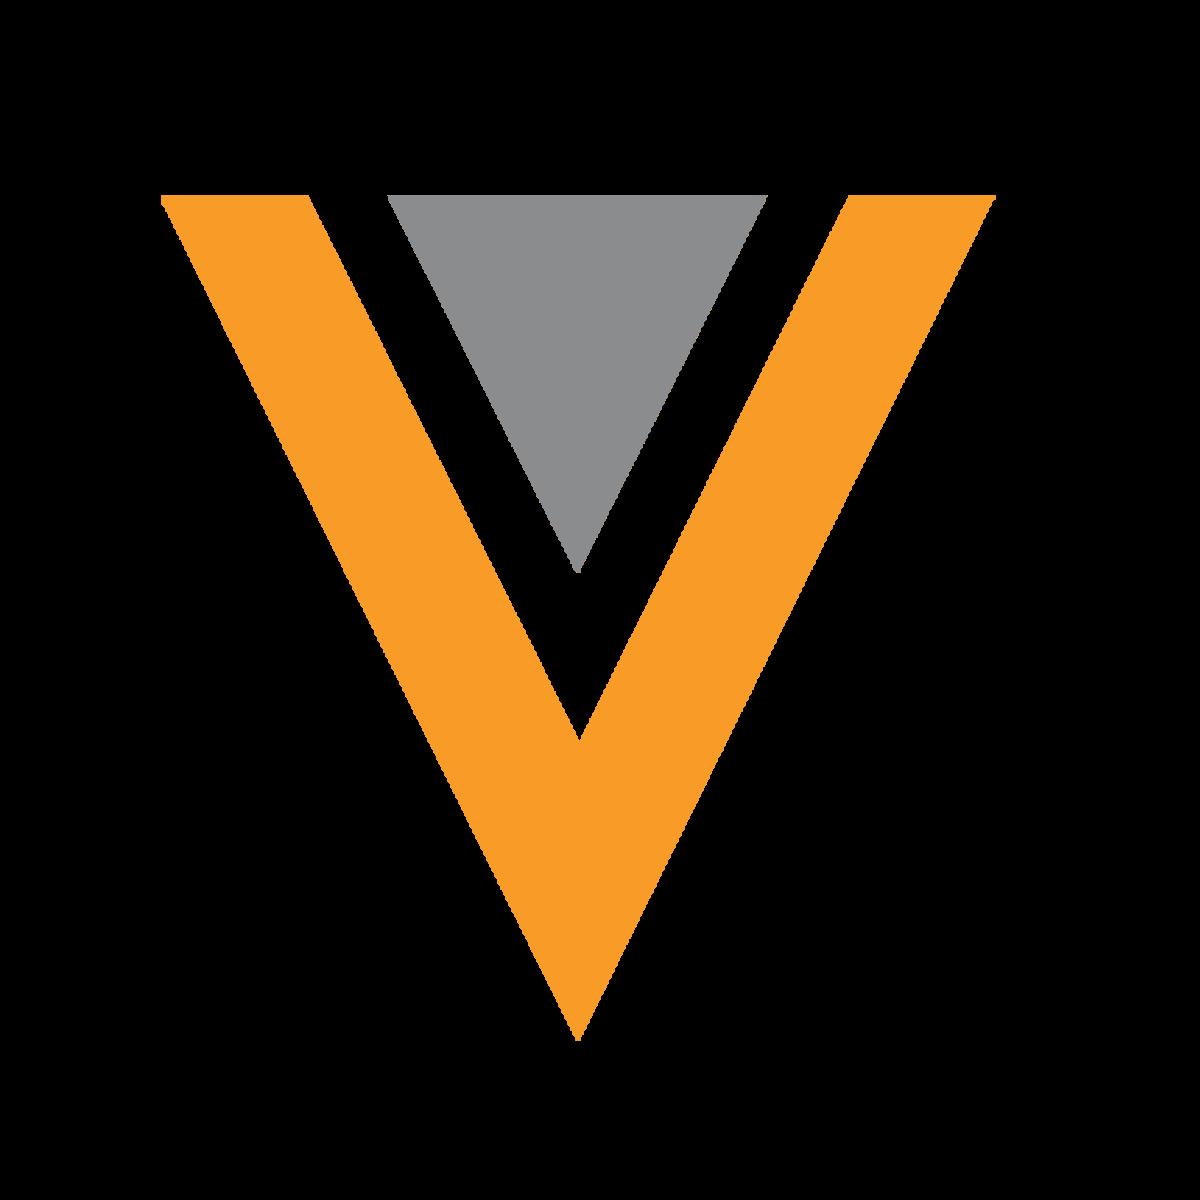 Veeva-logo-Social-1200.png